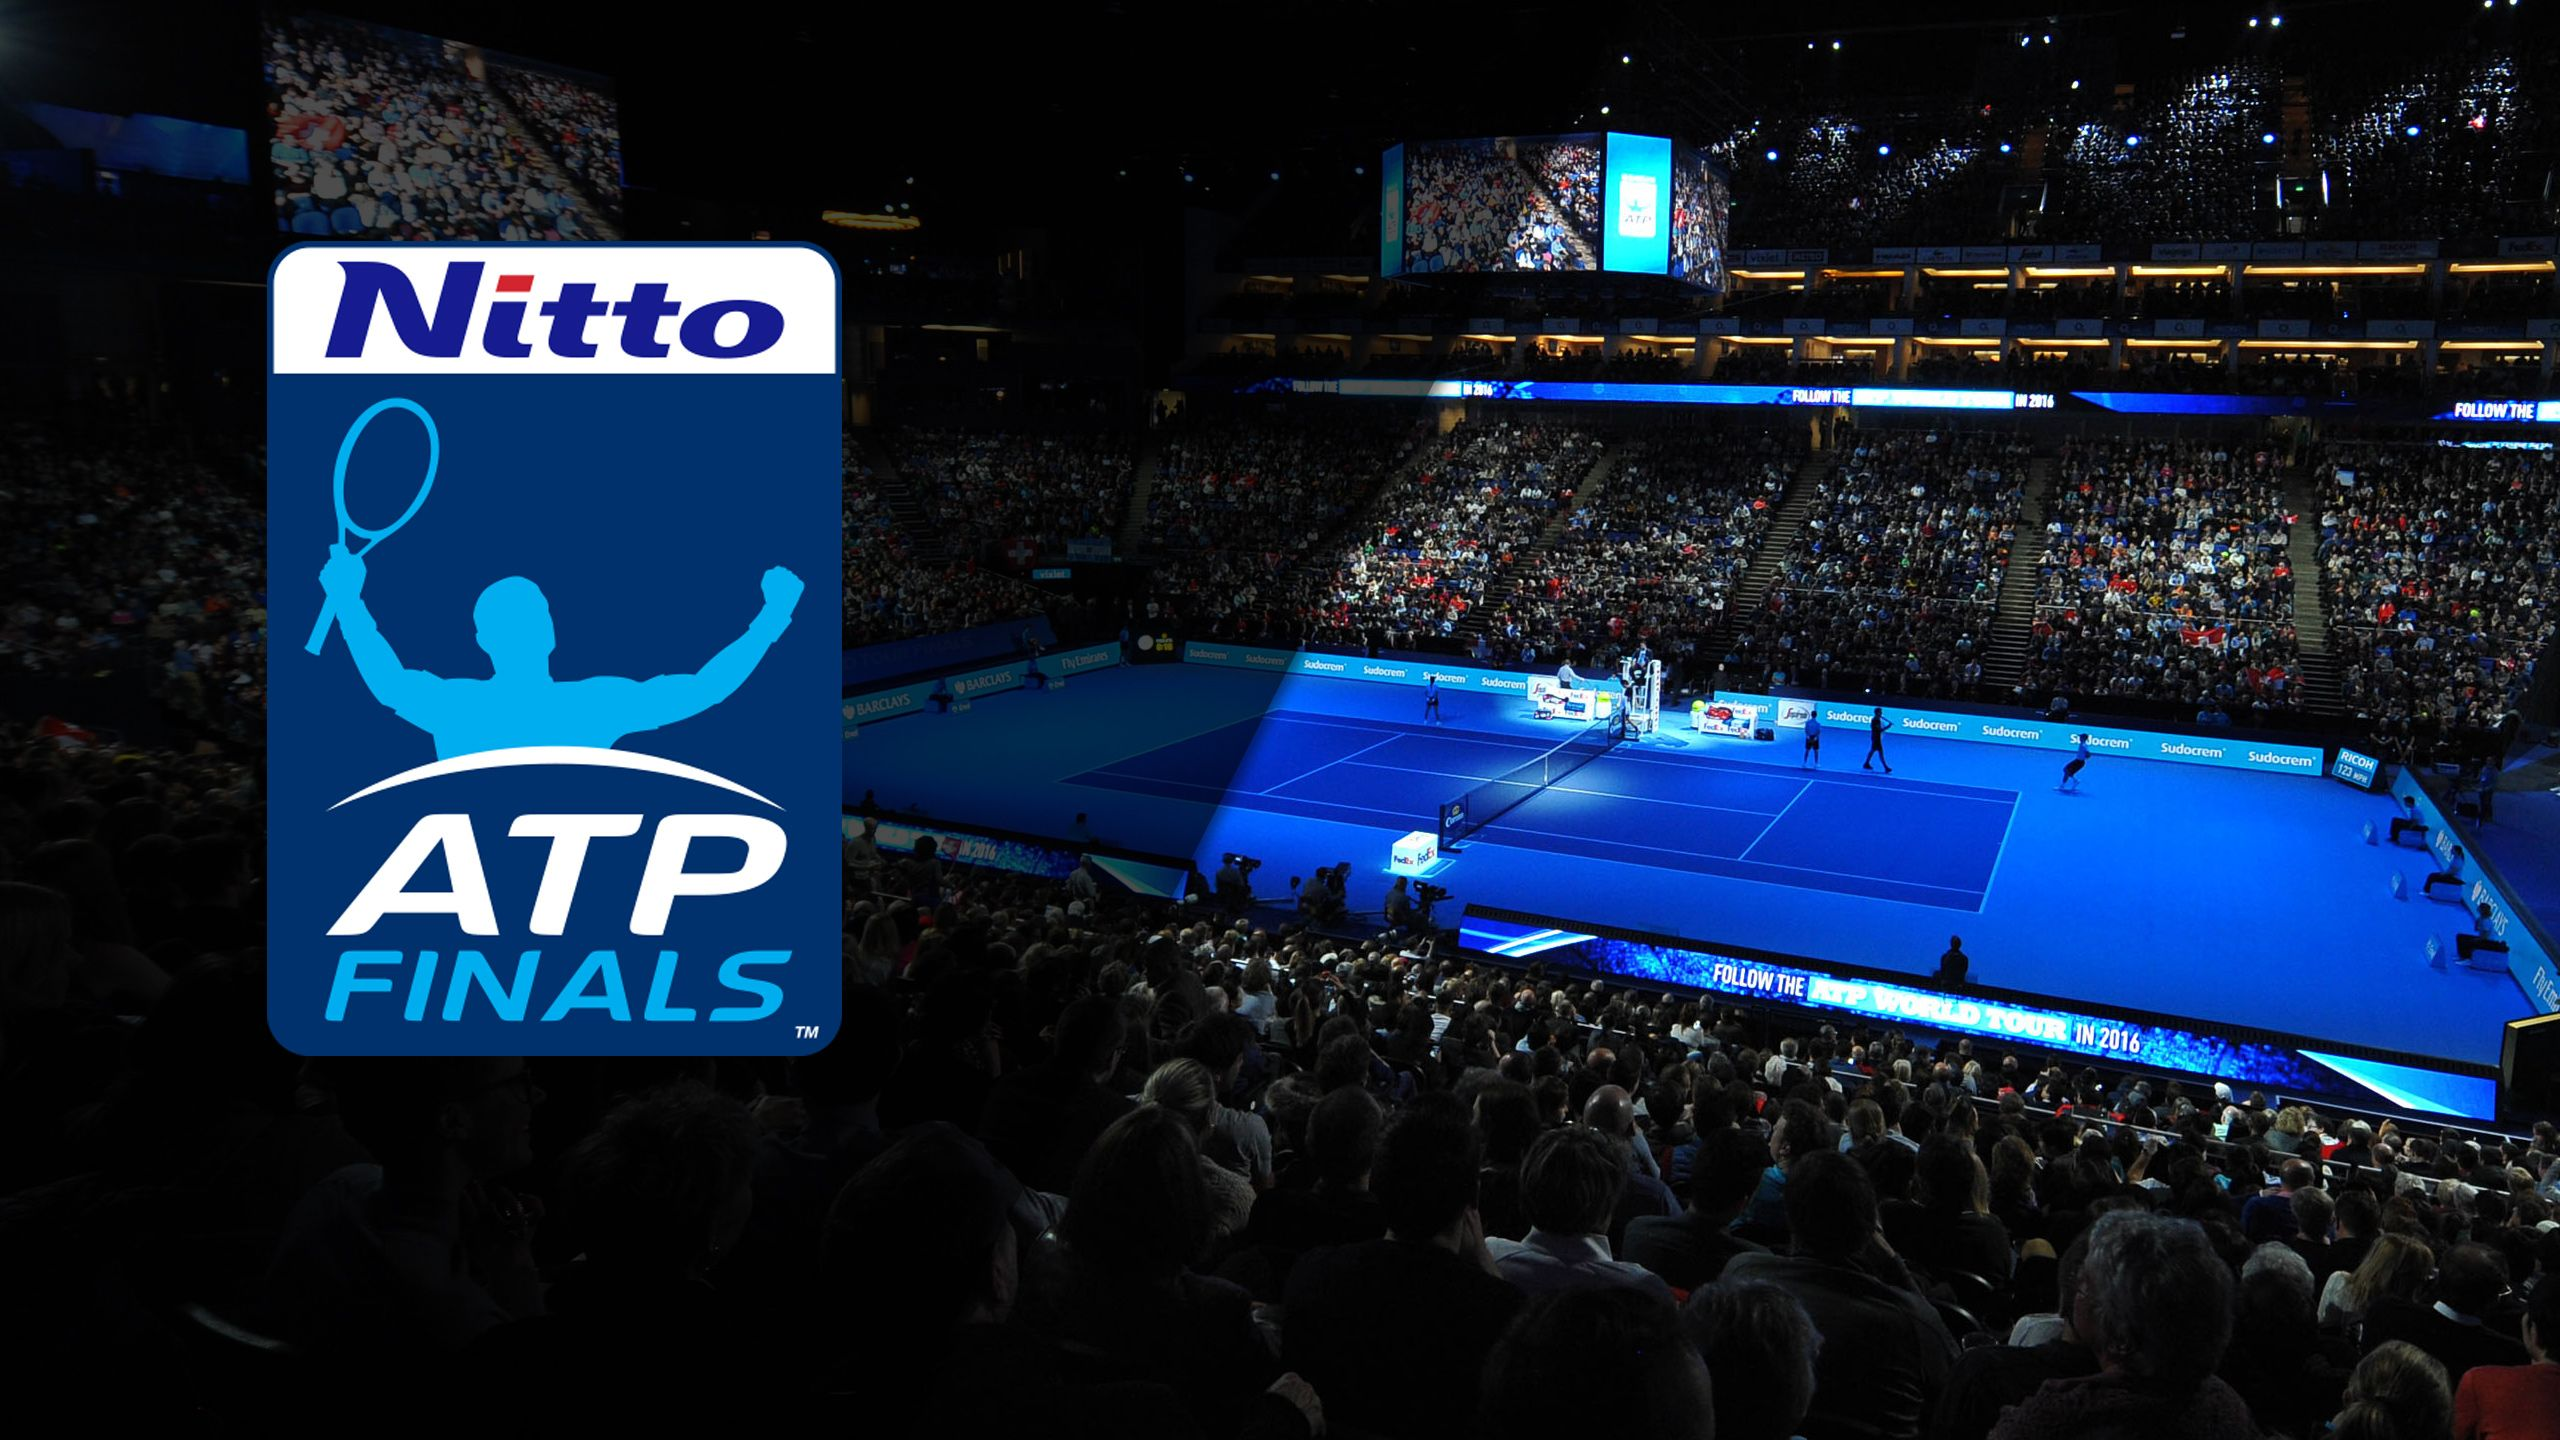 R. Harrison/M. Venus vs. L. Kubot/M. Melo - Nitto ATP Finals (Doubles Semifinal #1)